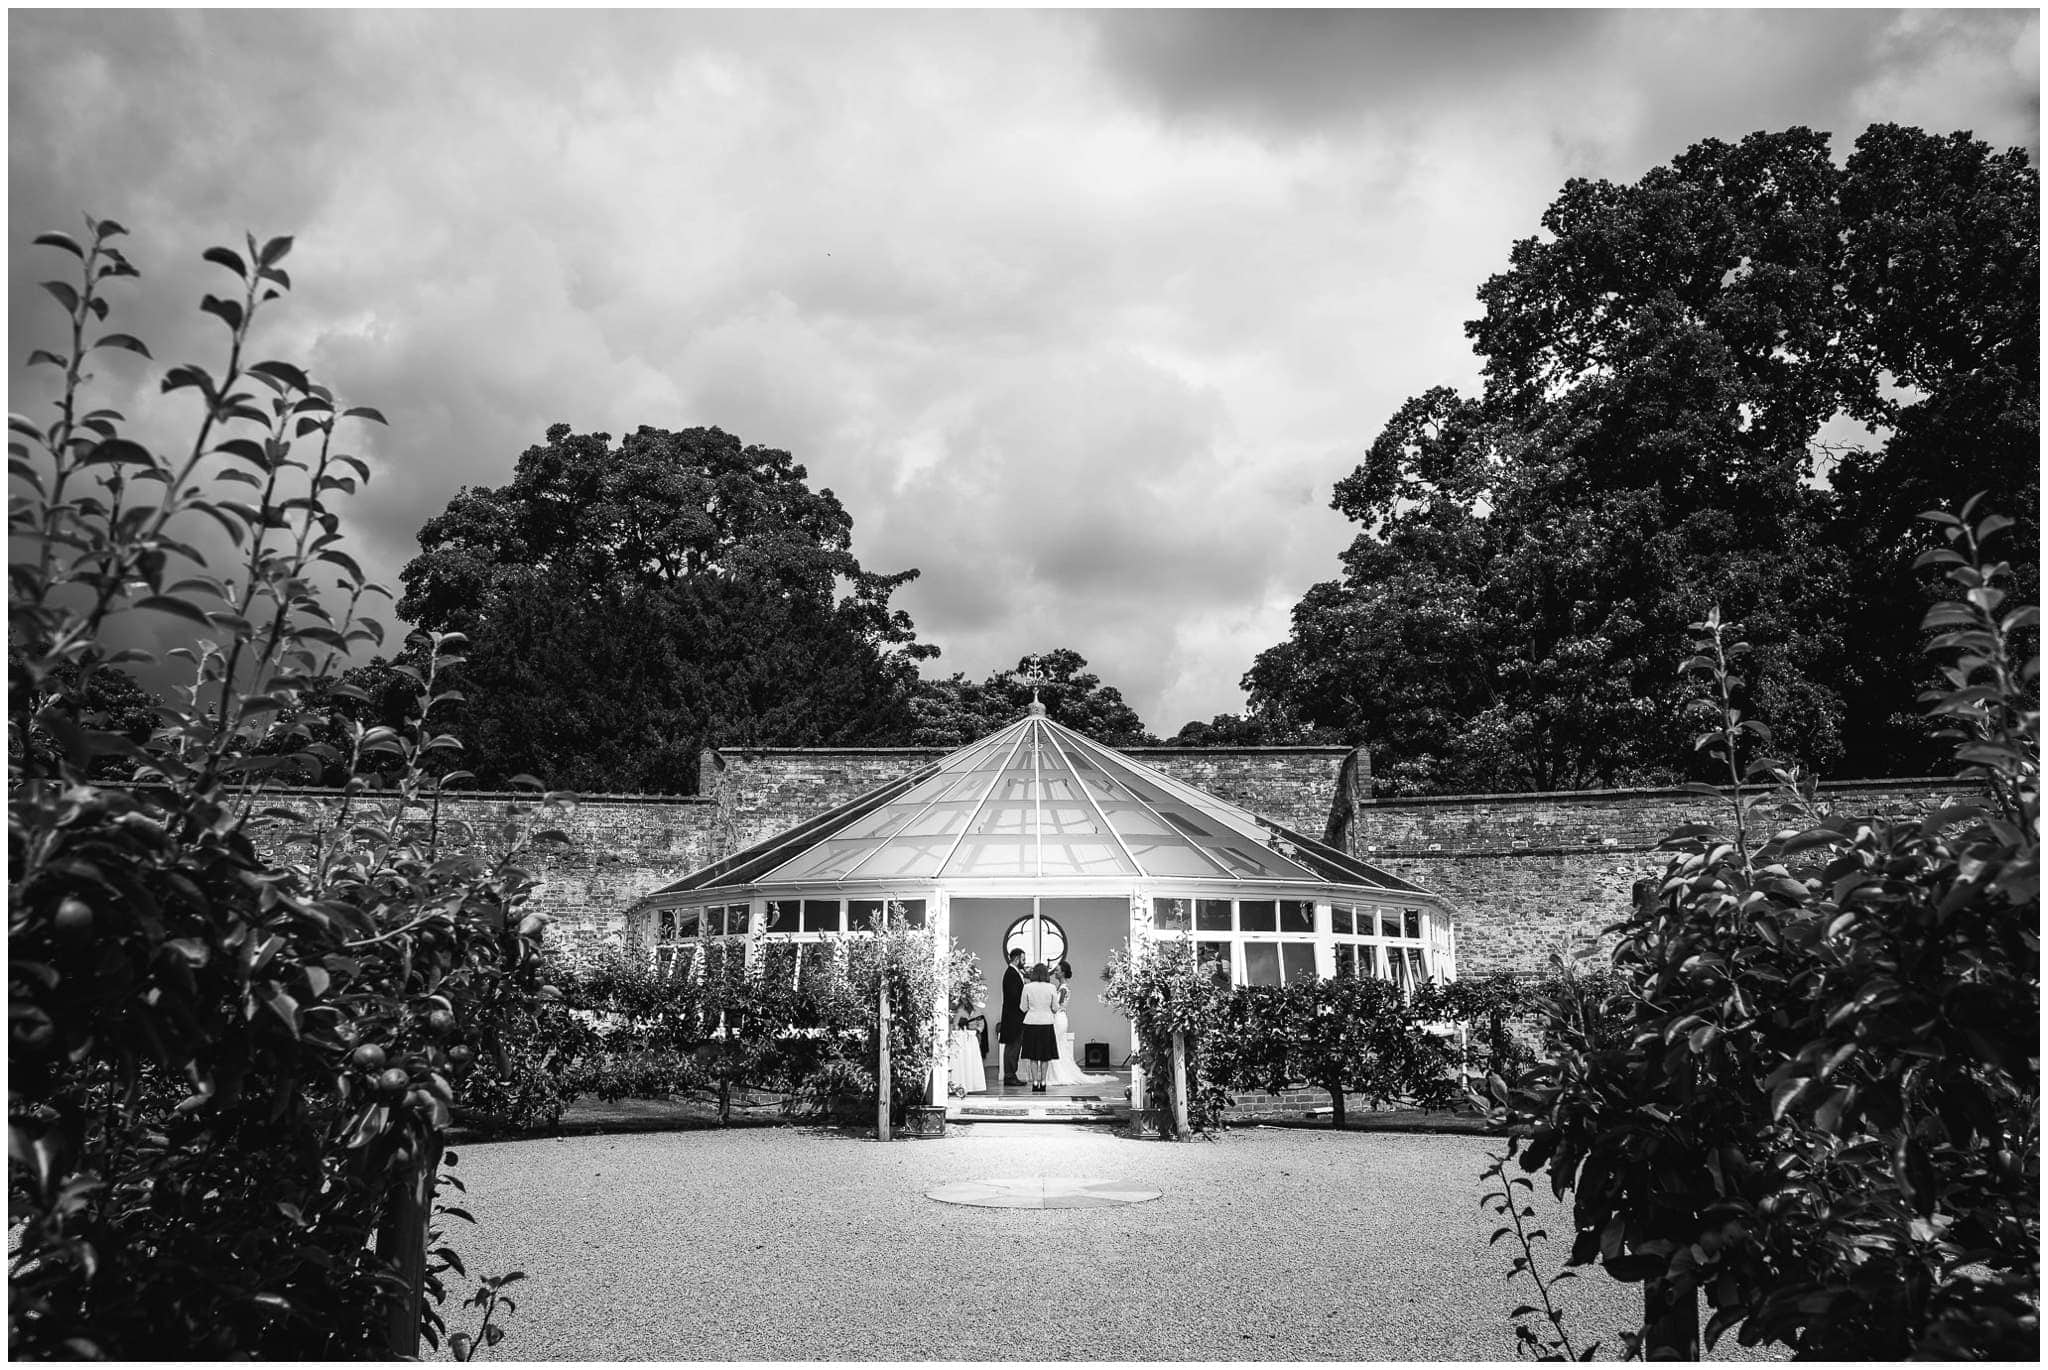 combermere-abbey-wedding-photographer-39